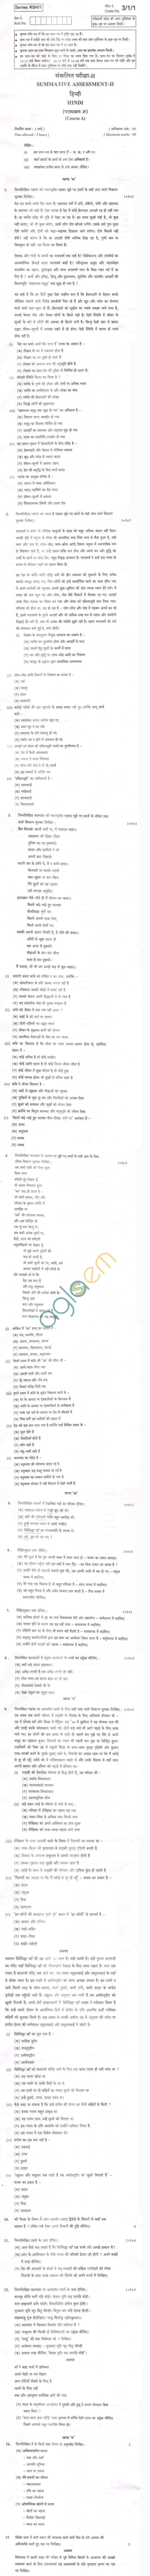 CBSE Board Exam 2013 Class X Question Paper -Hindi(Course A)